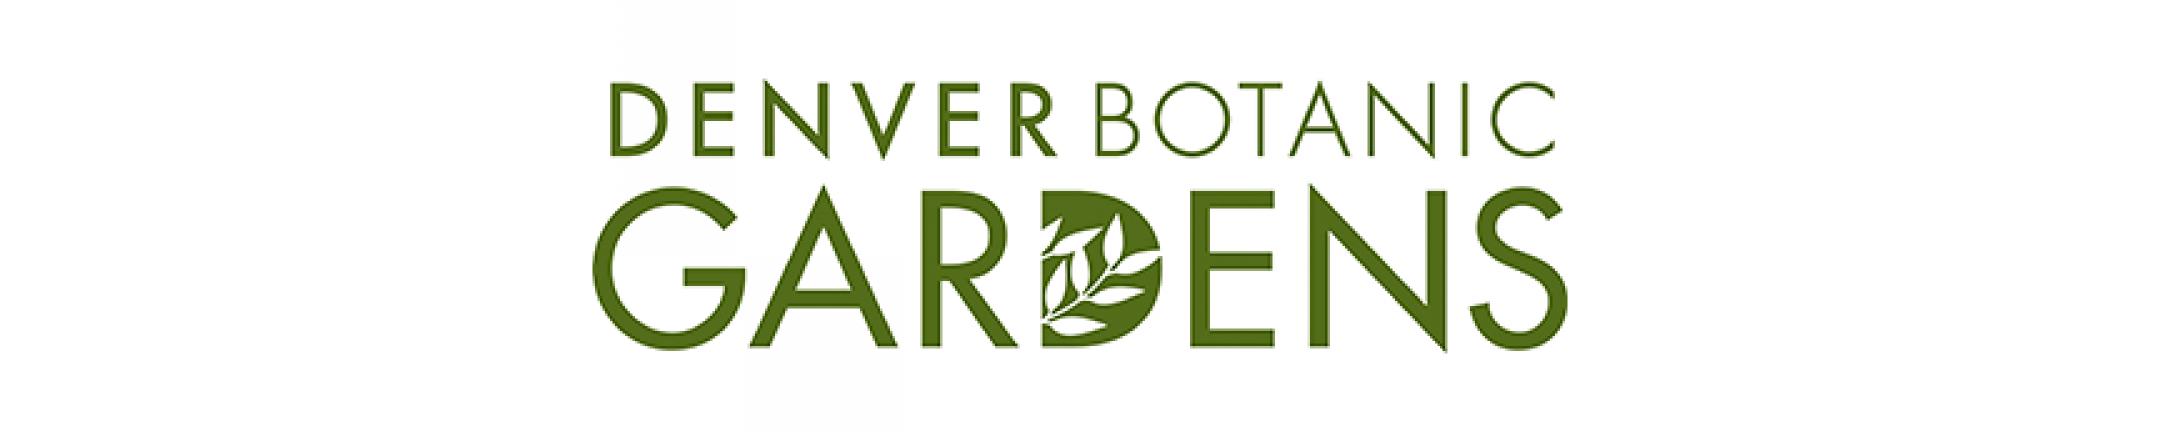 denver_botanical_gardens_logo.png